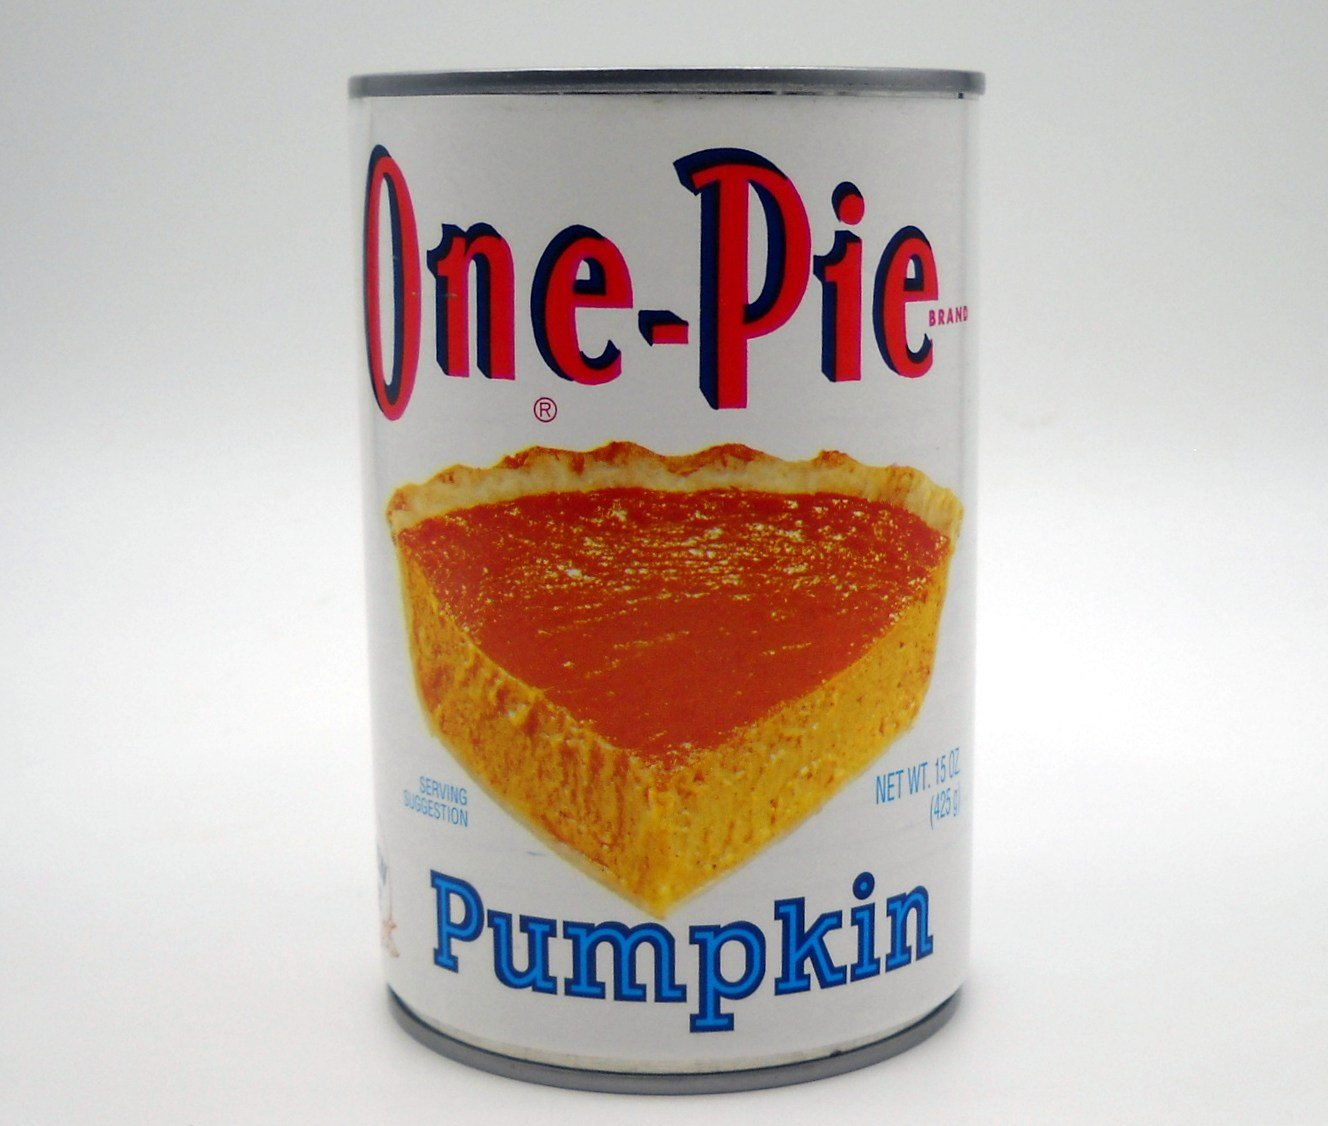 One-Pie Pumpkin pie filling